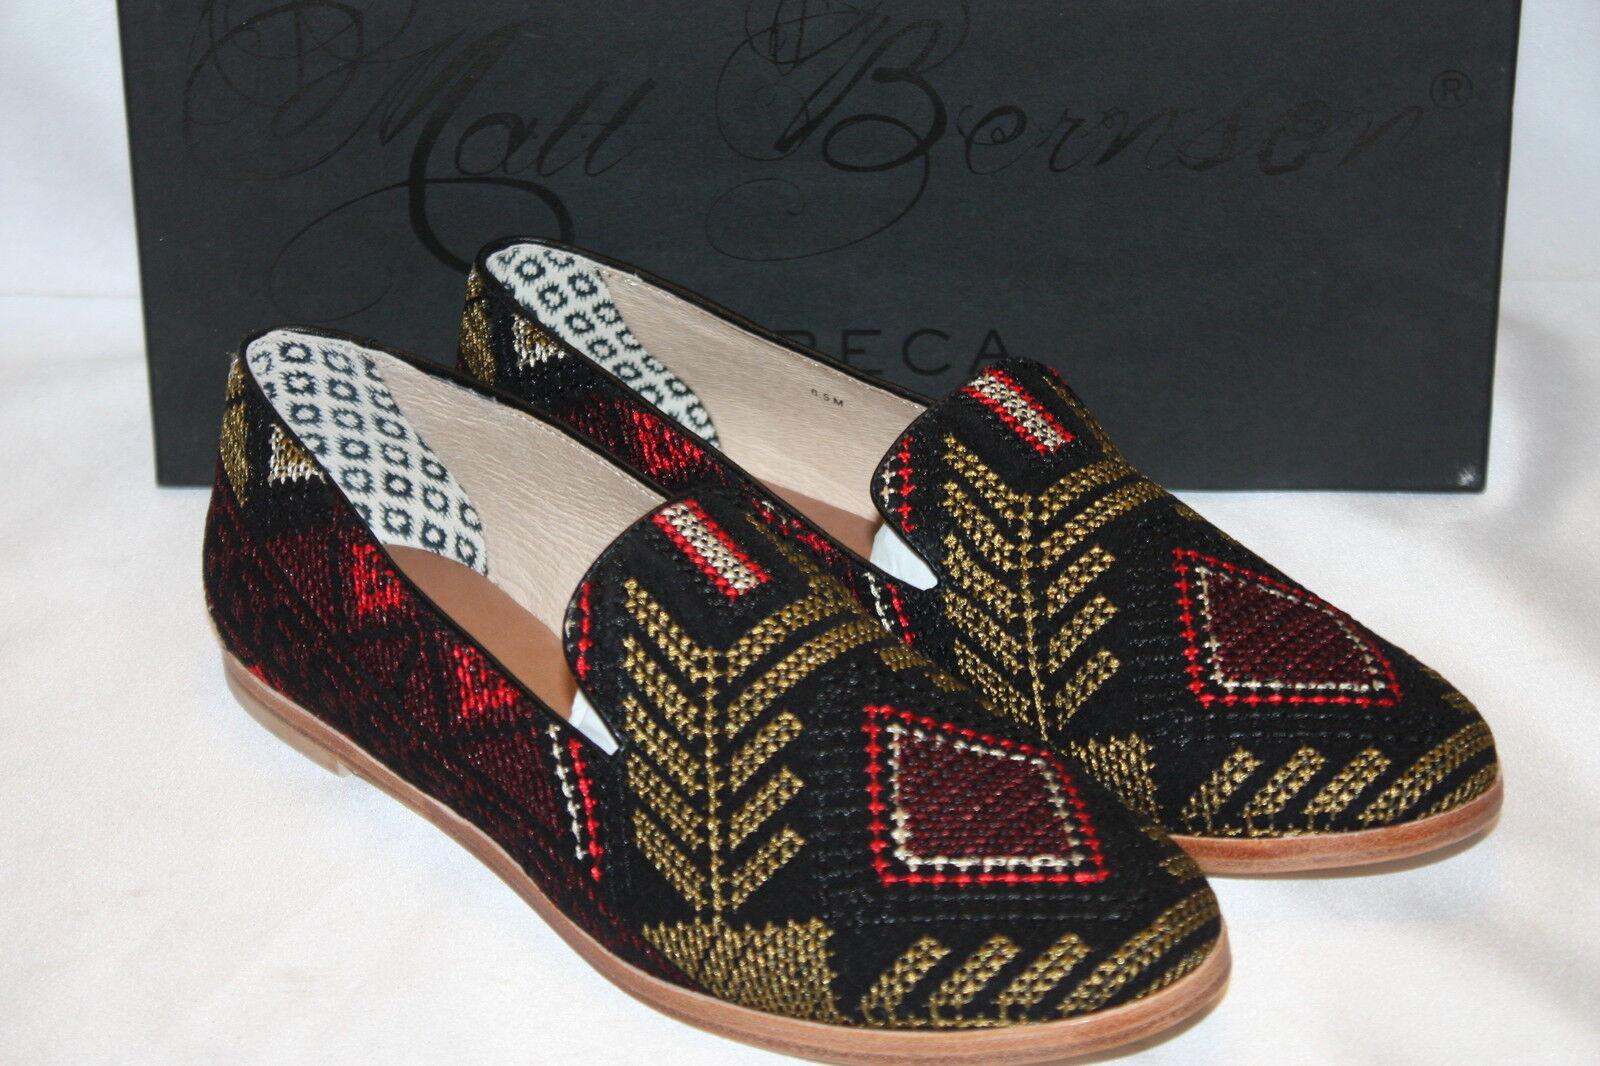 NEW! NIB! MATT BERNSON Black Needlepoint GITANES Smoking Shoes Loafers 6.5 $168